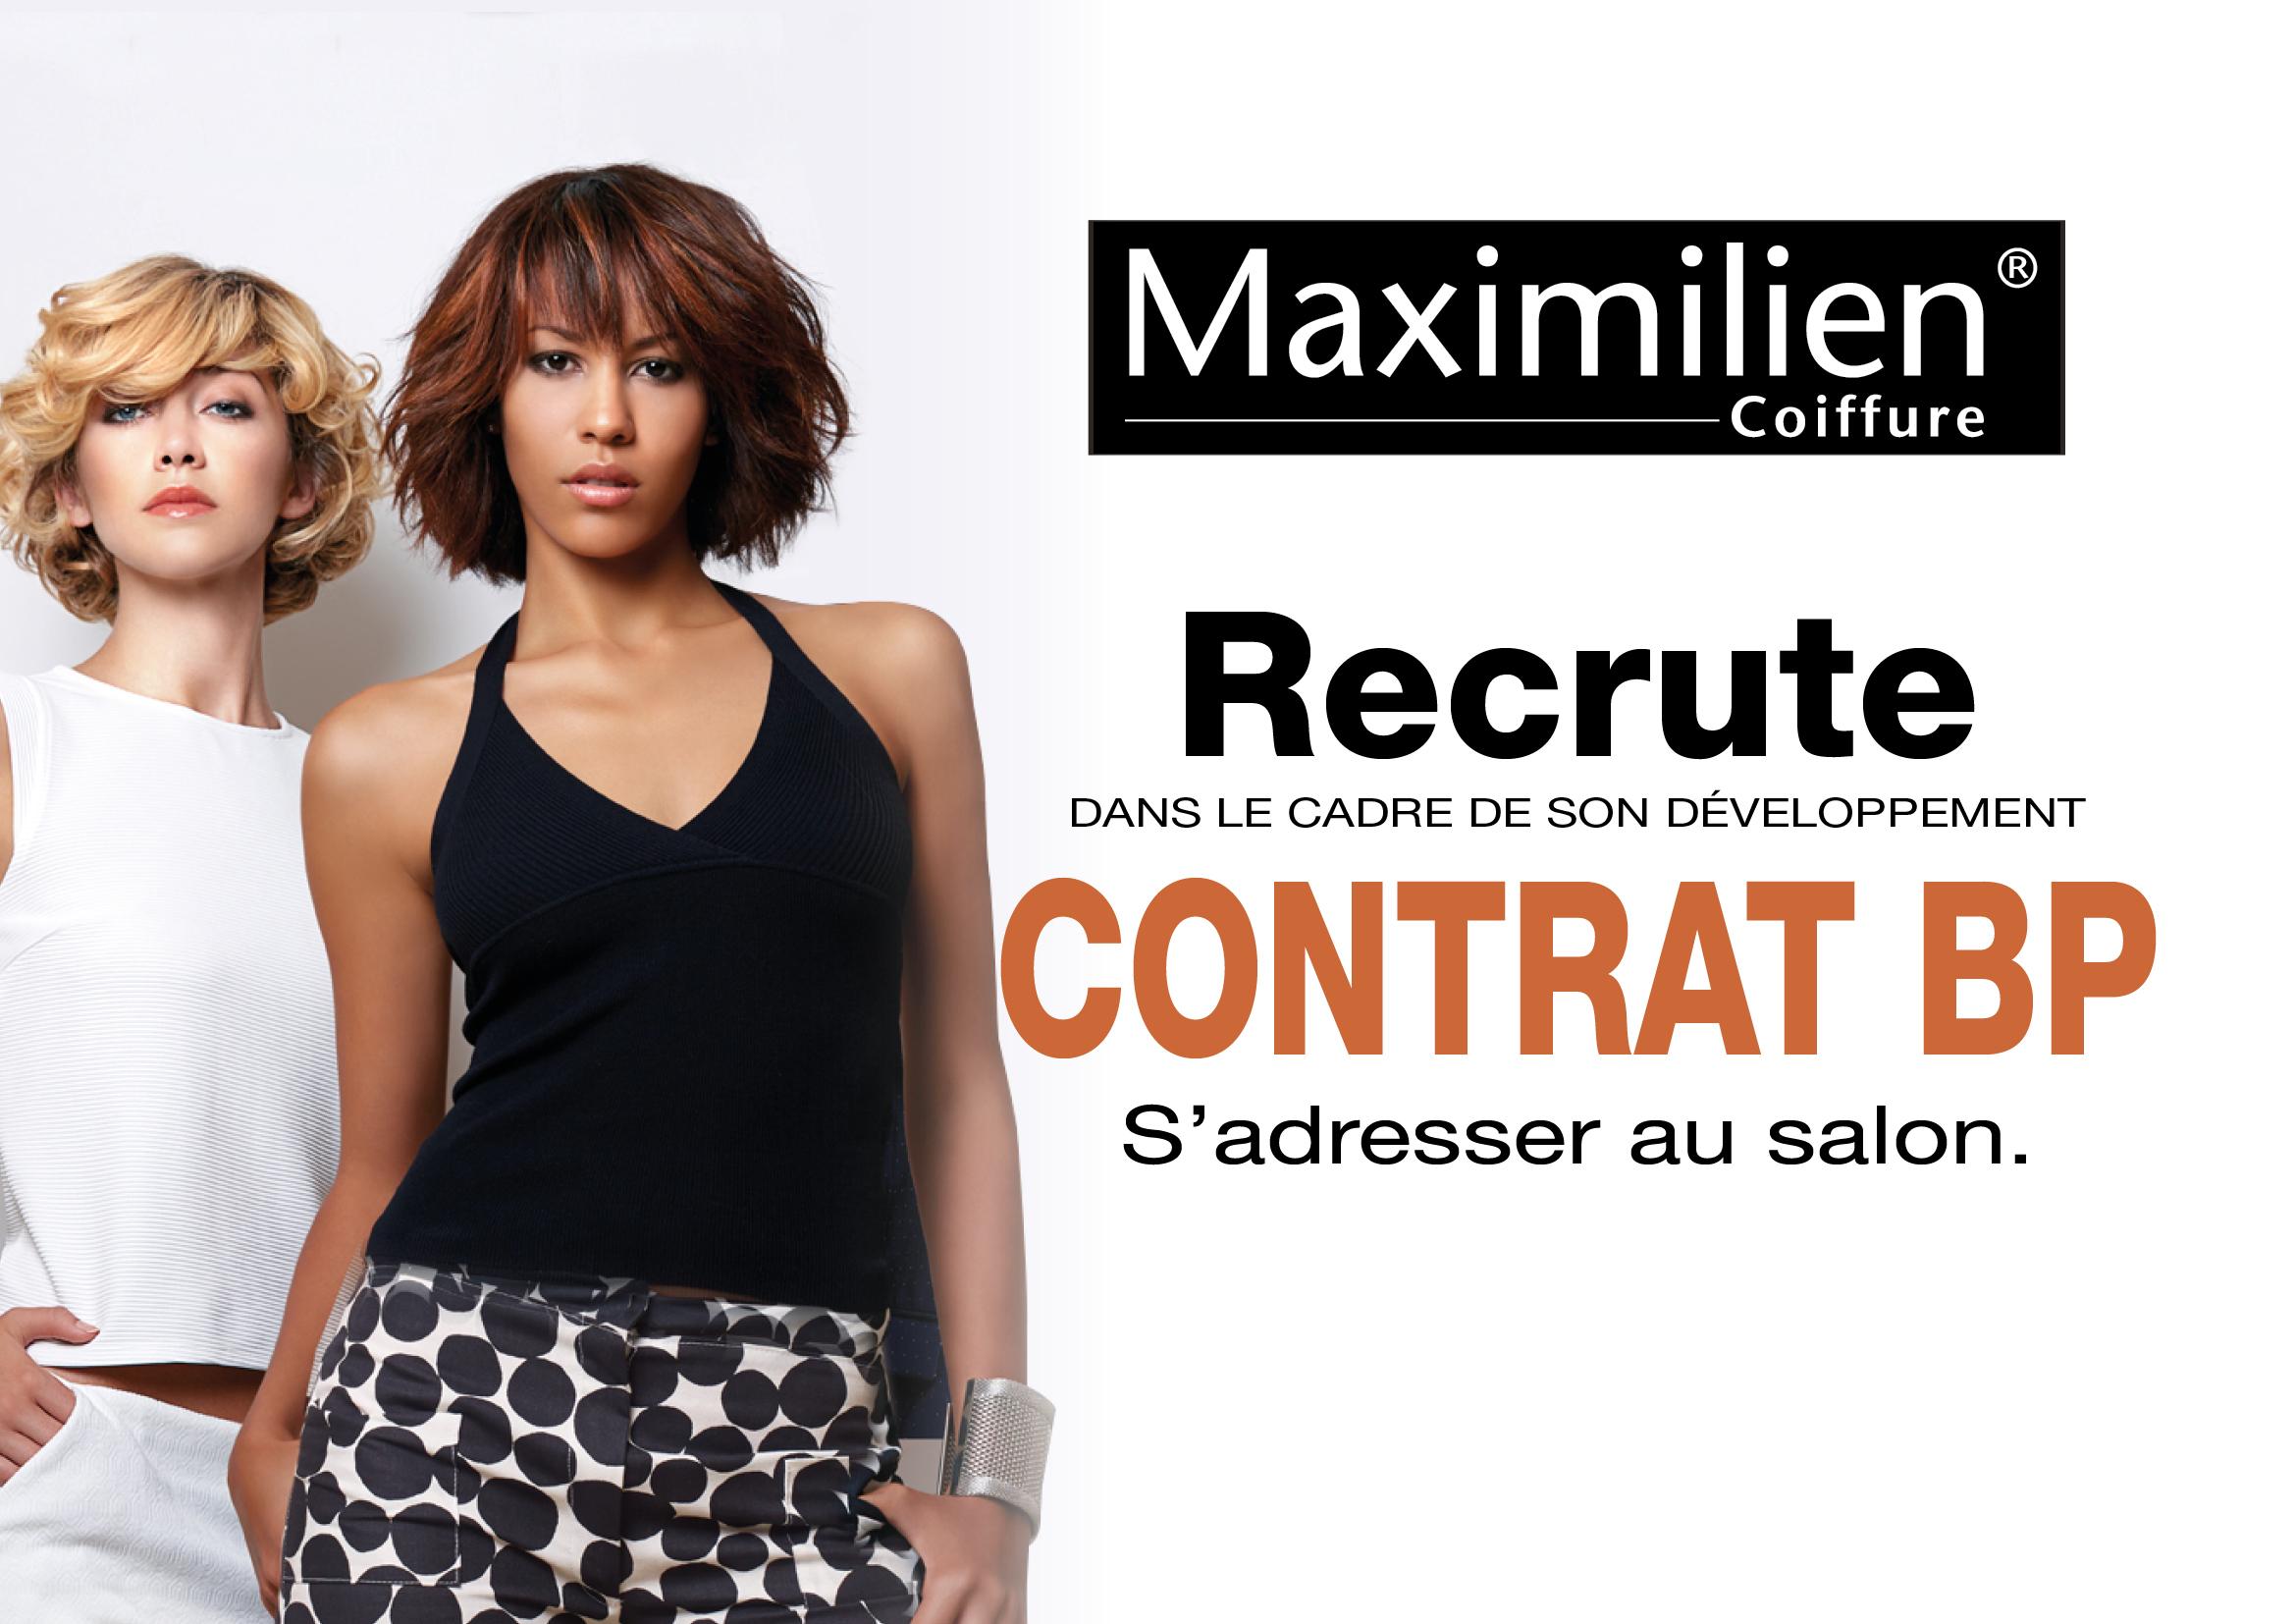 Maximilien Coiffure recrute